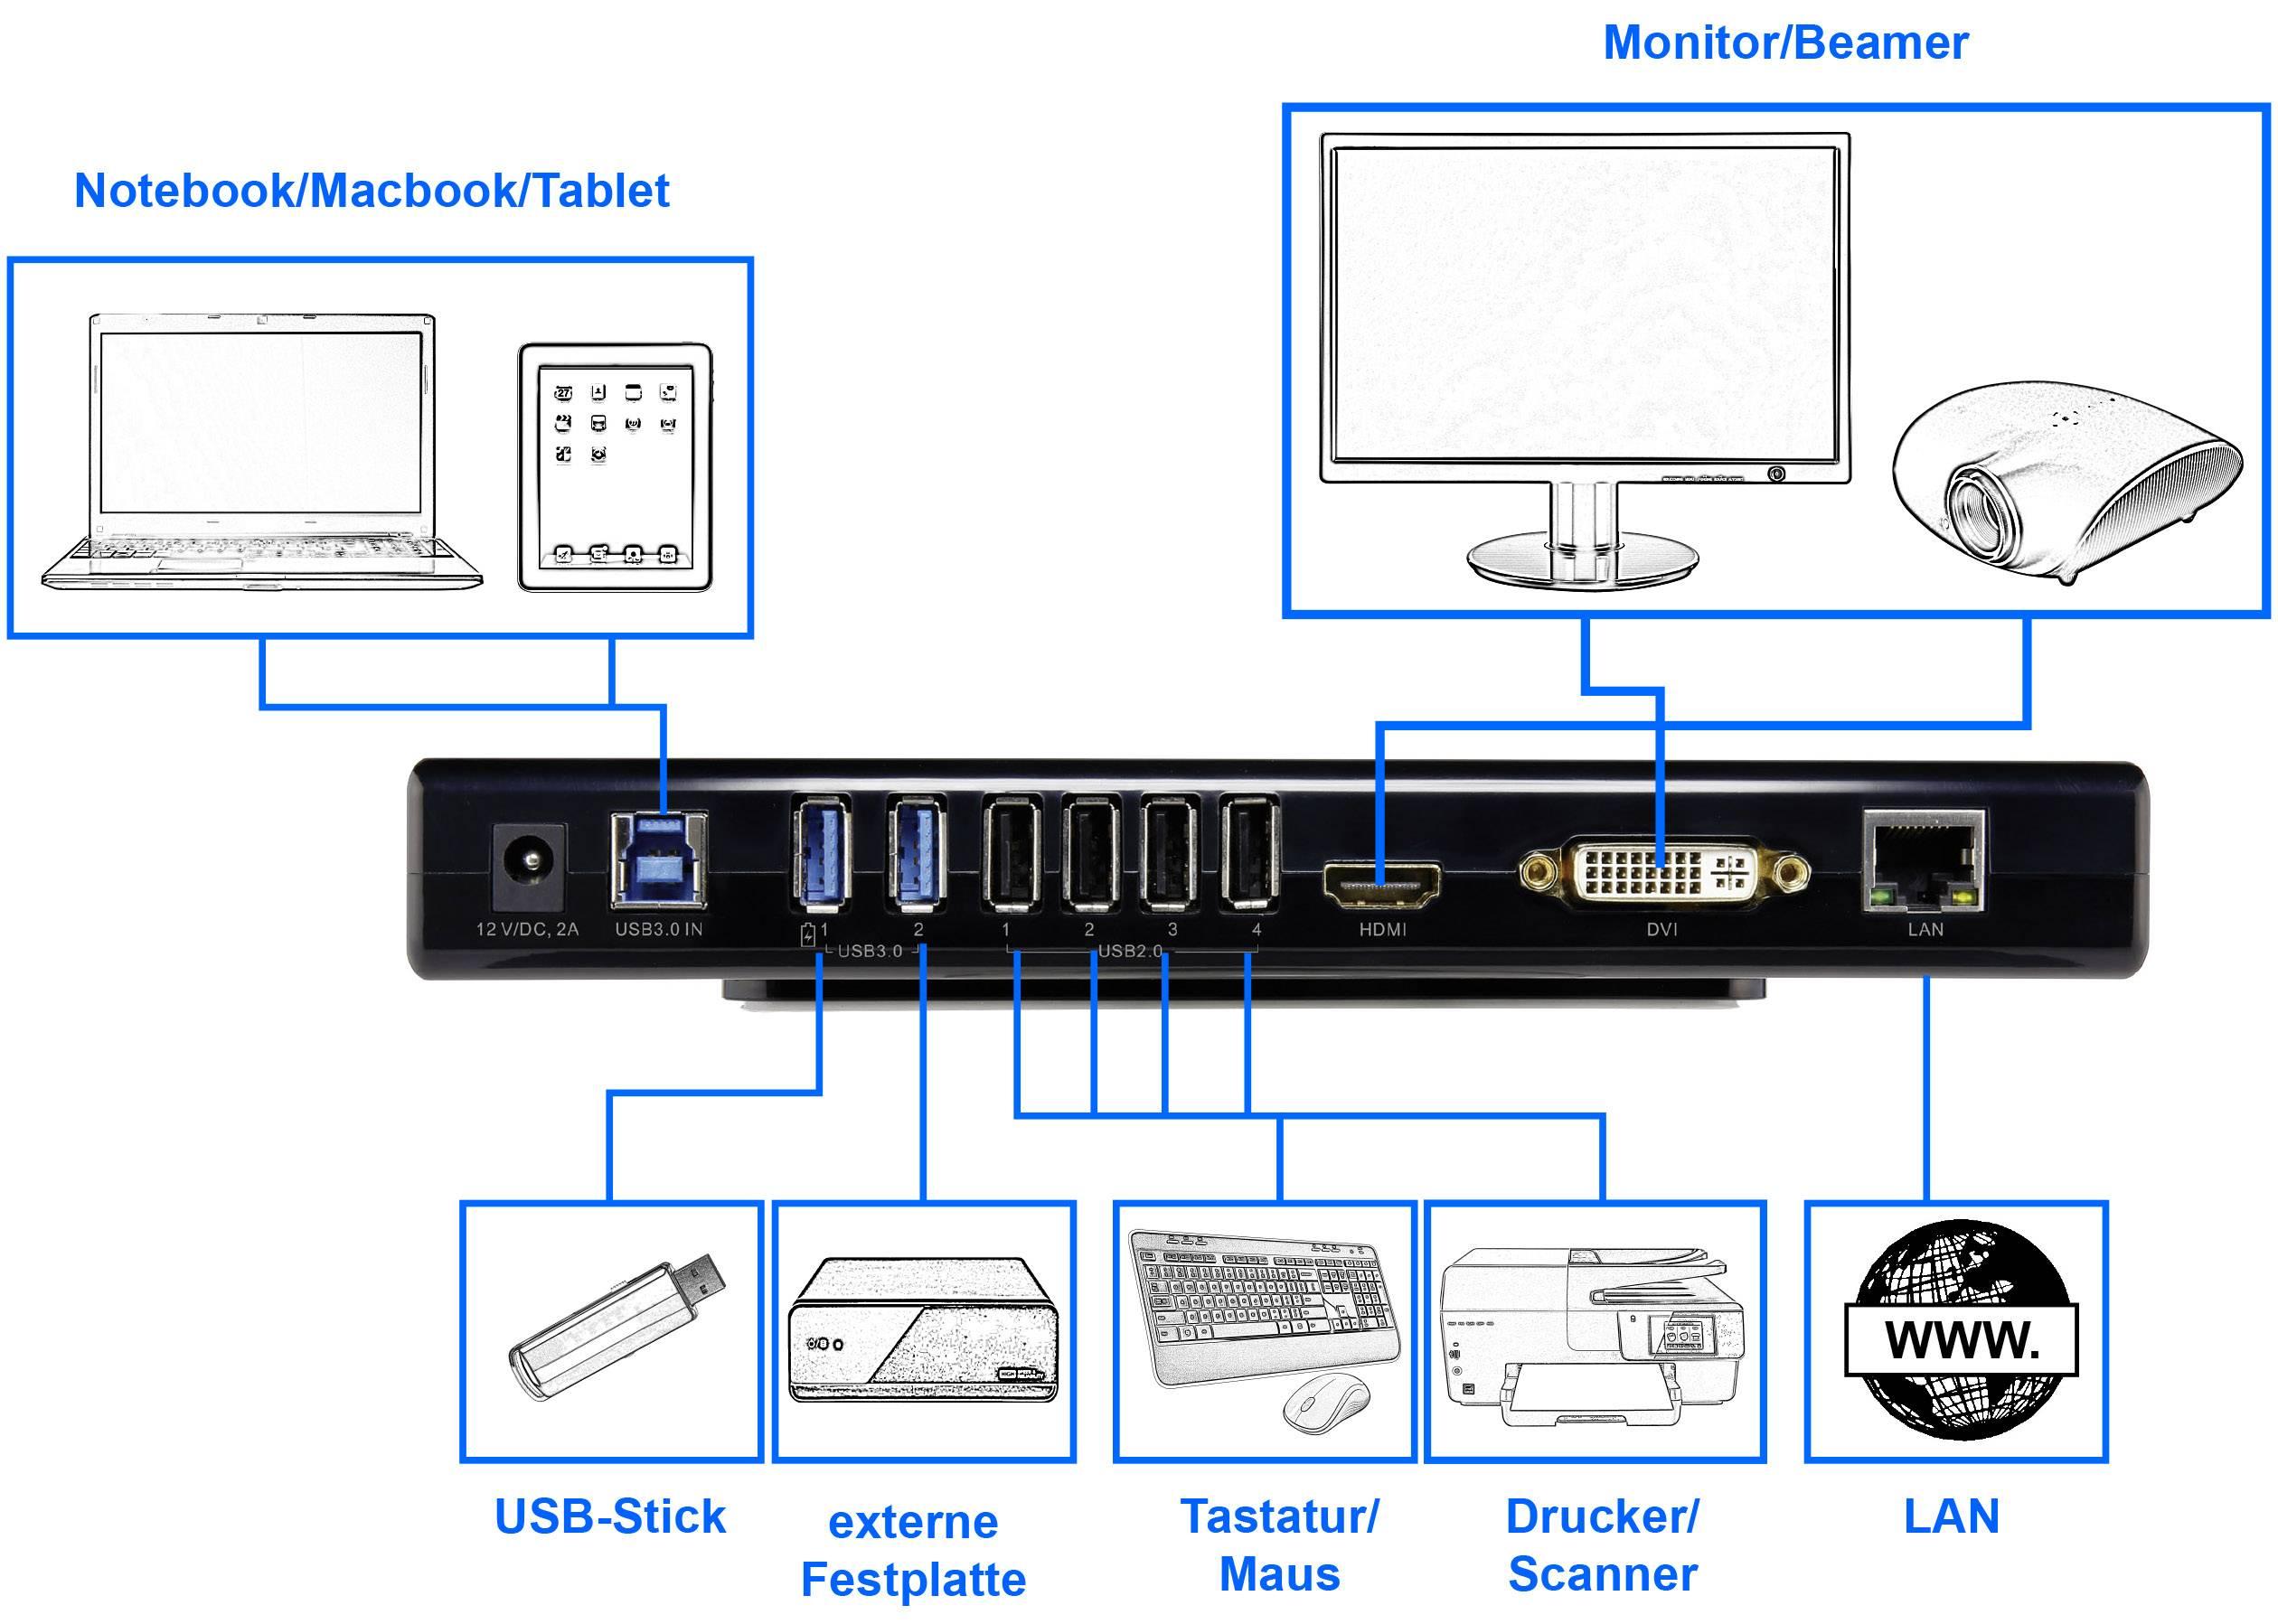 renkforcelaptop docking stationuniversal 2x usb 3 0 4x usb 2 0 1x hdmi headphones 1x dvi 1x lan 10 100 1000 mbps  [ 1000 x 1000 Pixel ]